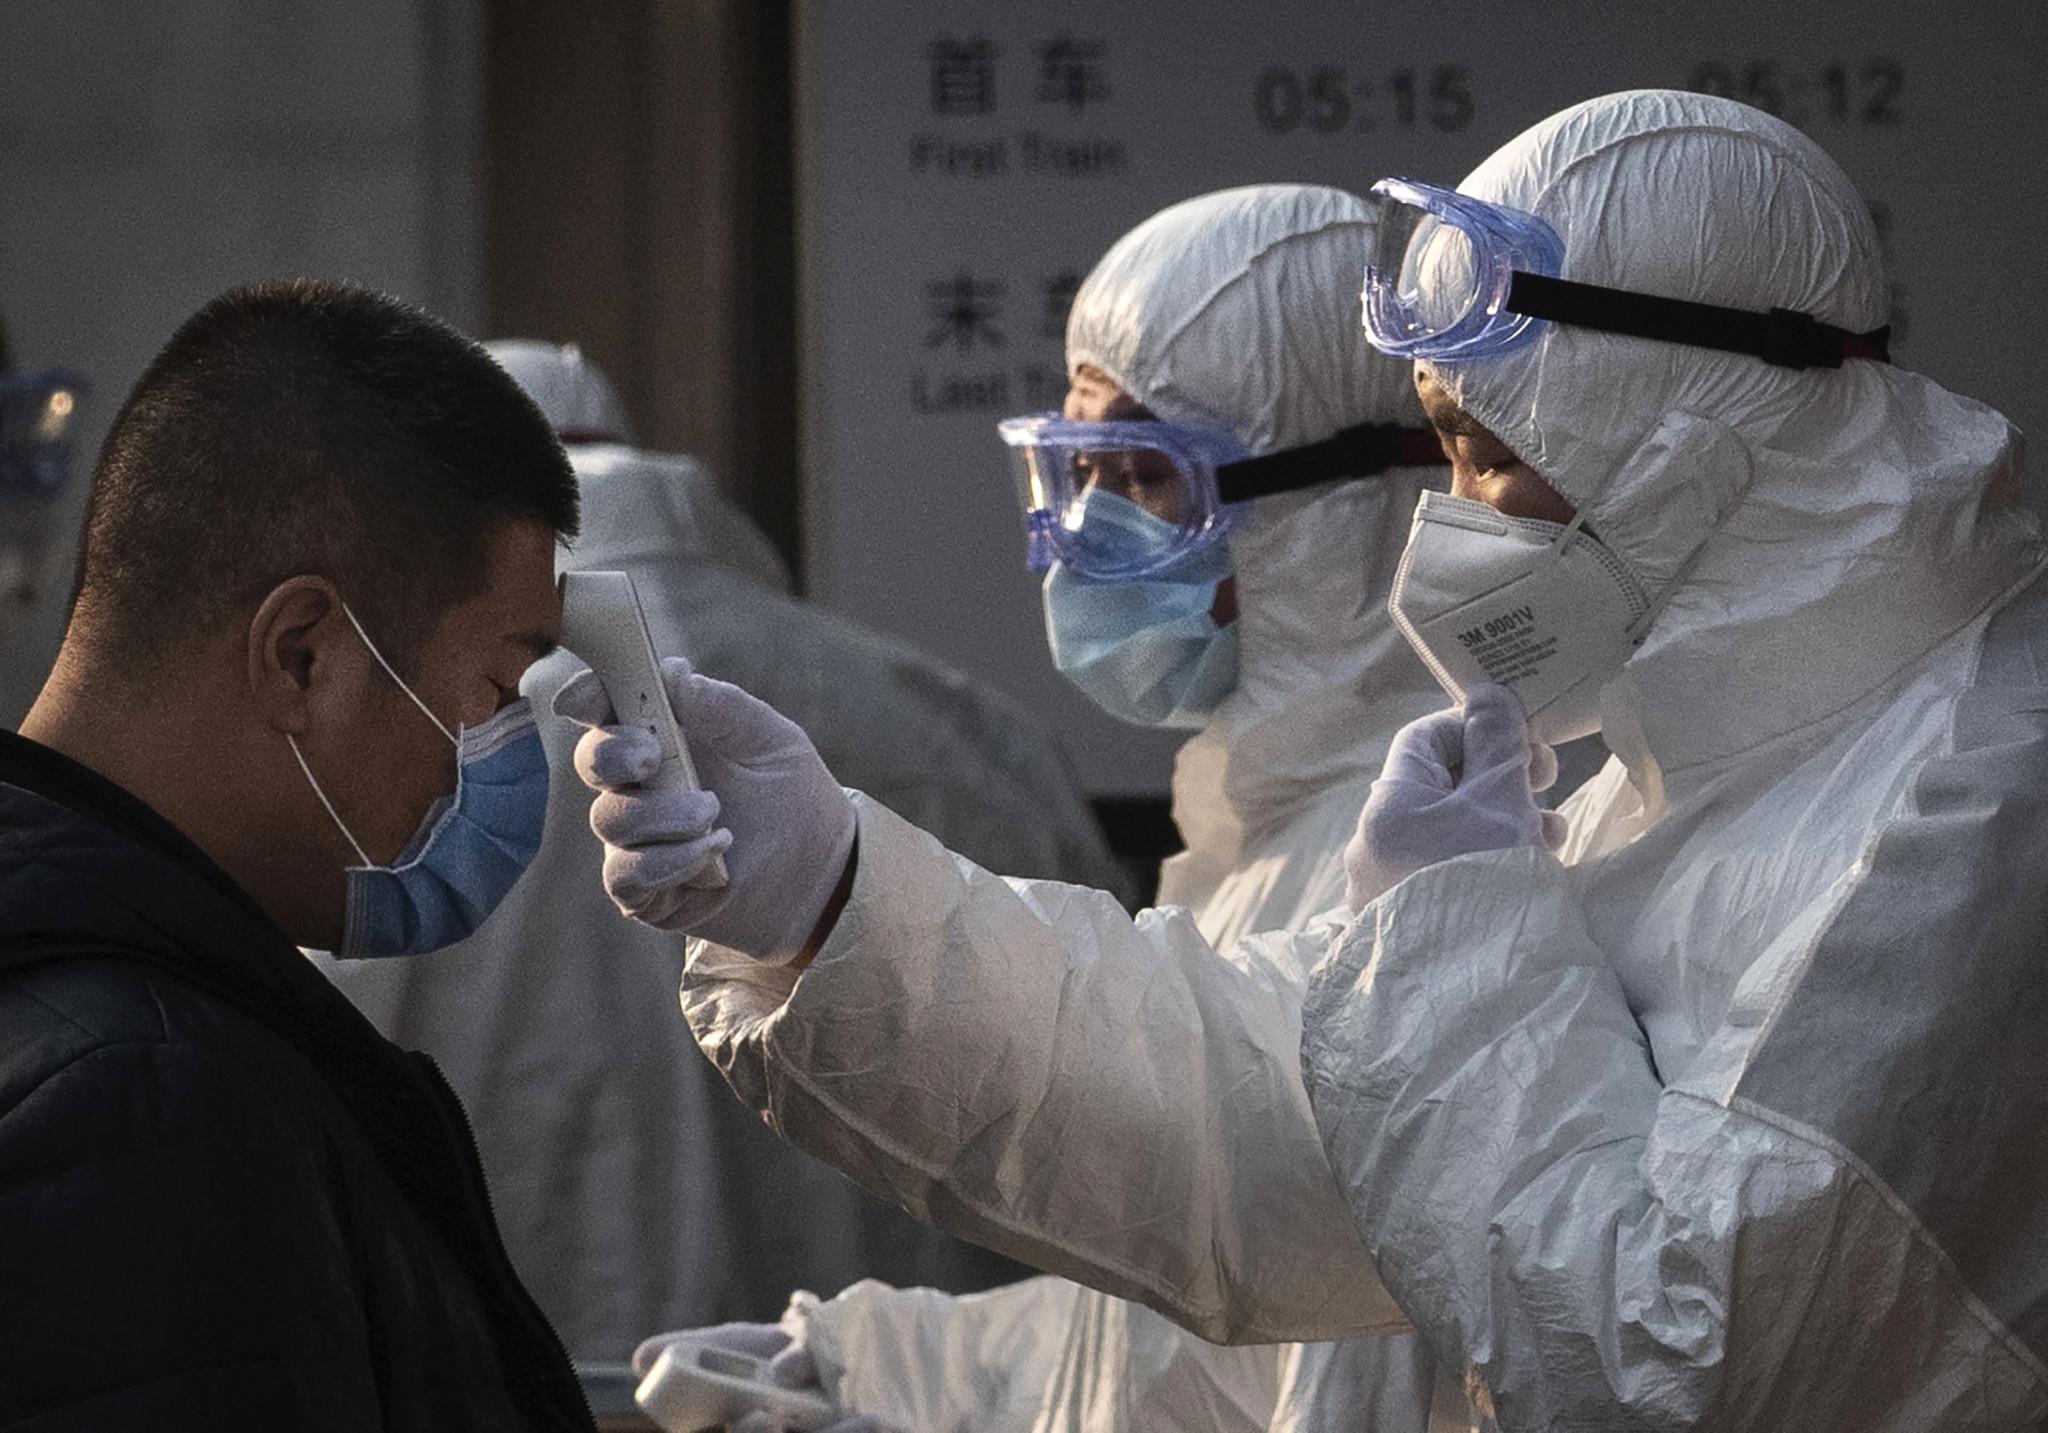 Bird's Nest Stadium among public buildings closed in China because of coronavirus